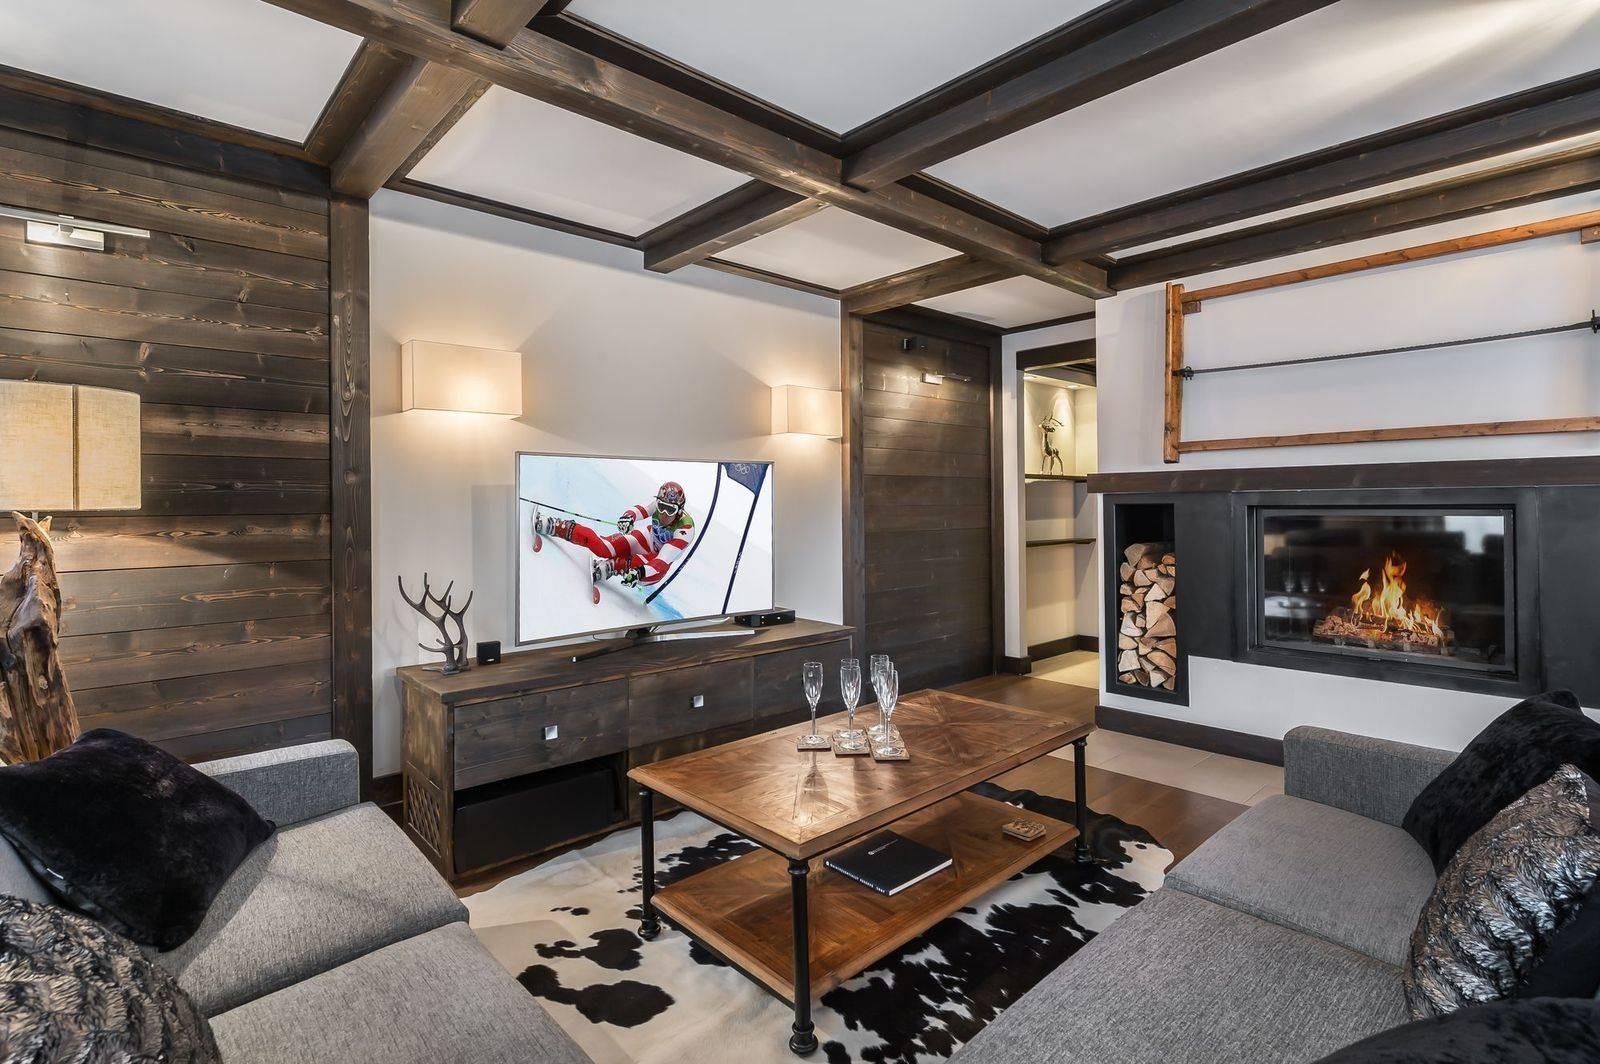 Courchevel 1650 Luxury Rental Appartment Neroflier Living Room 3